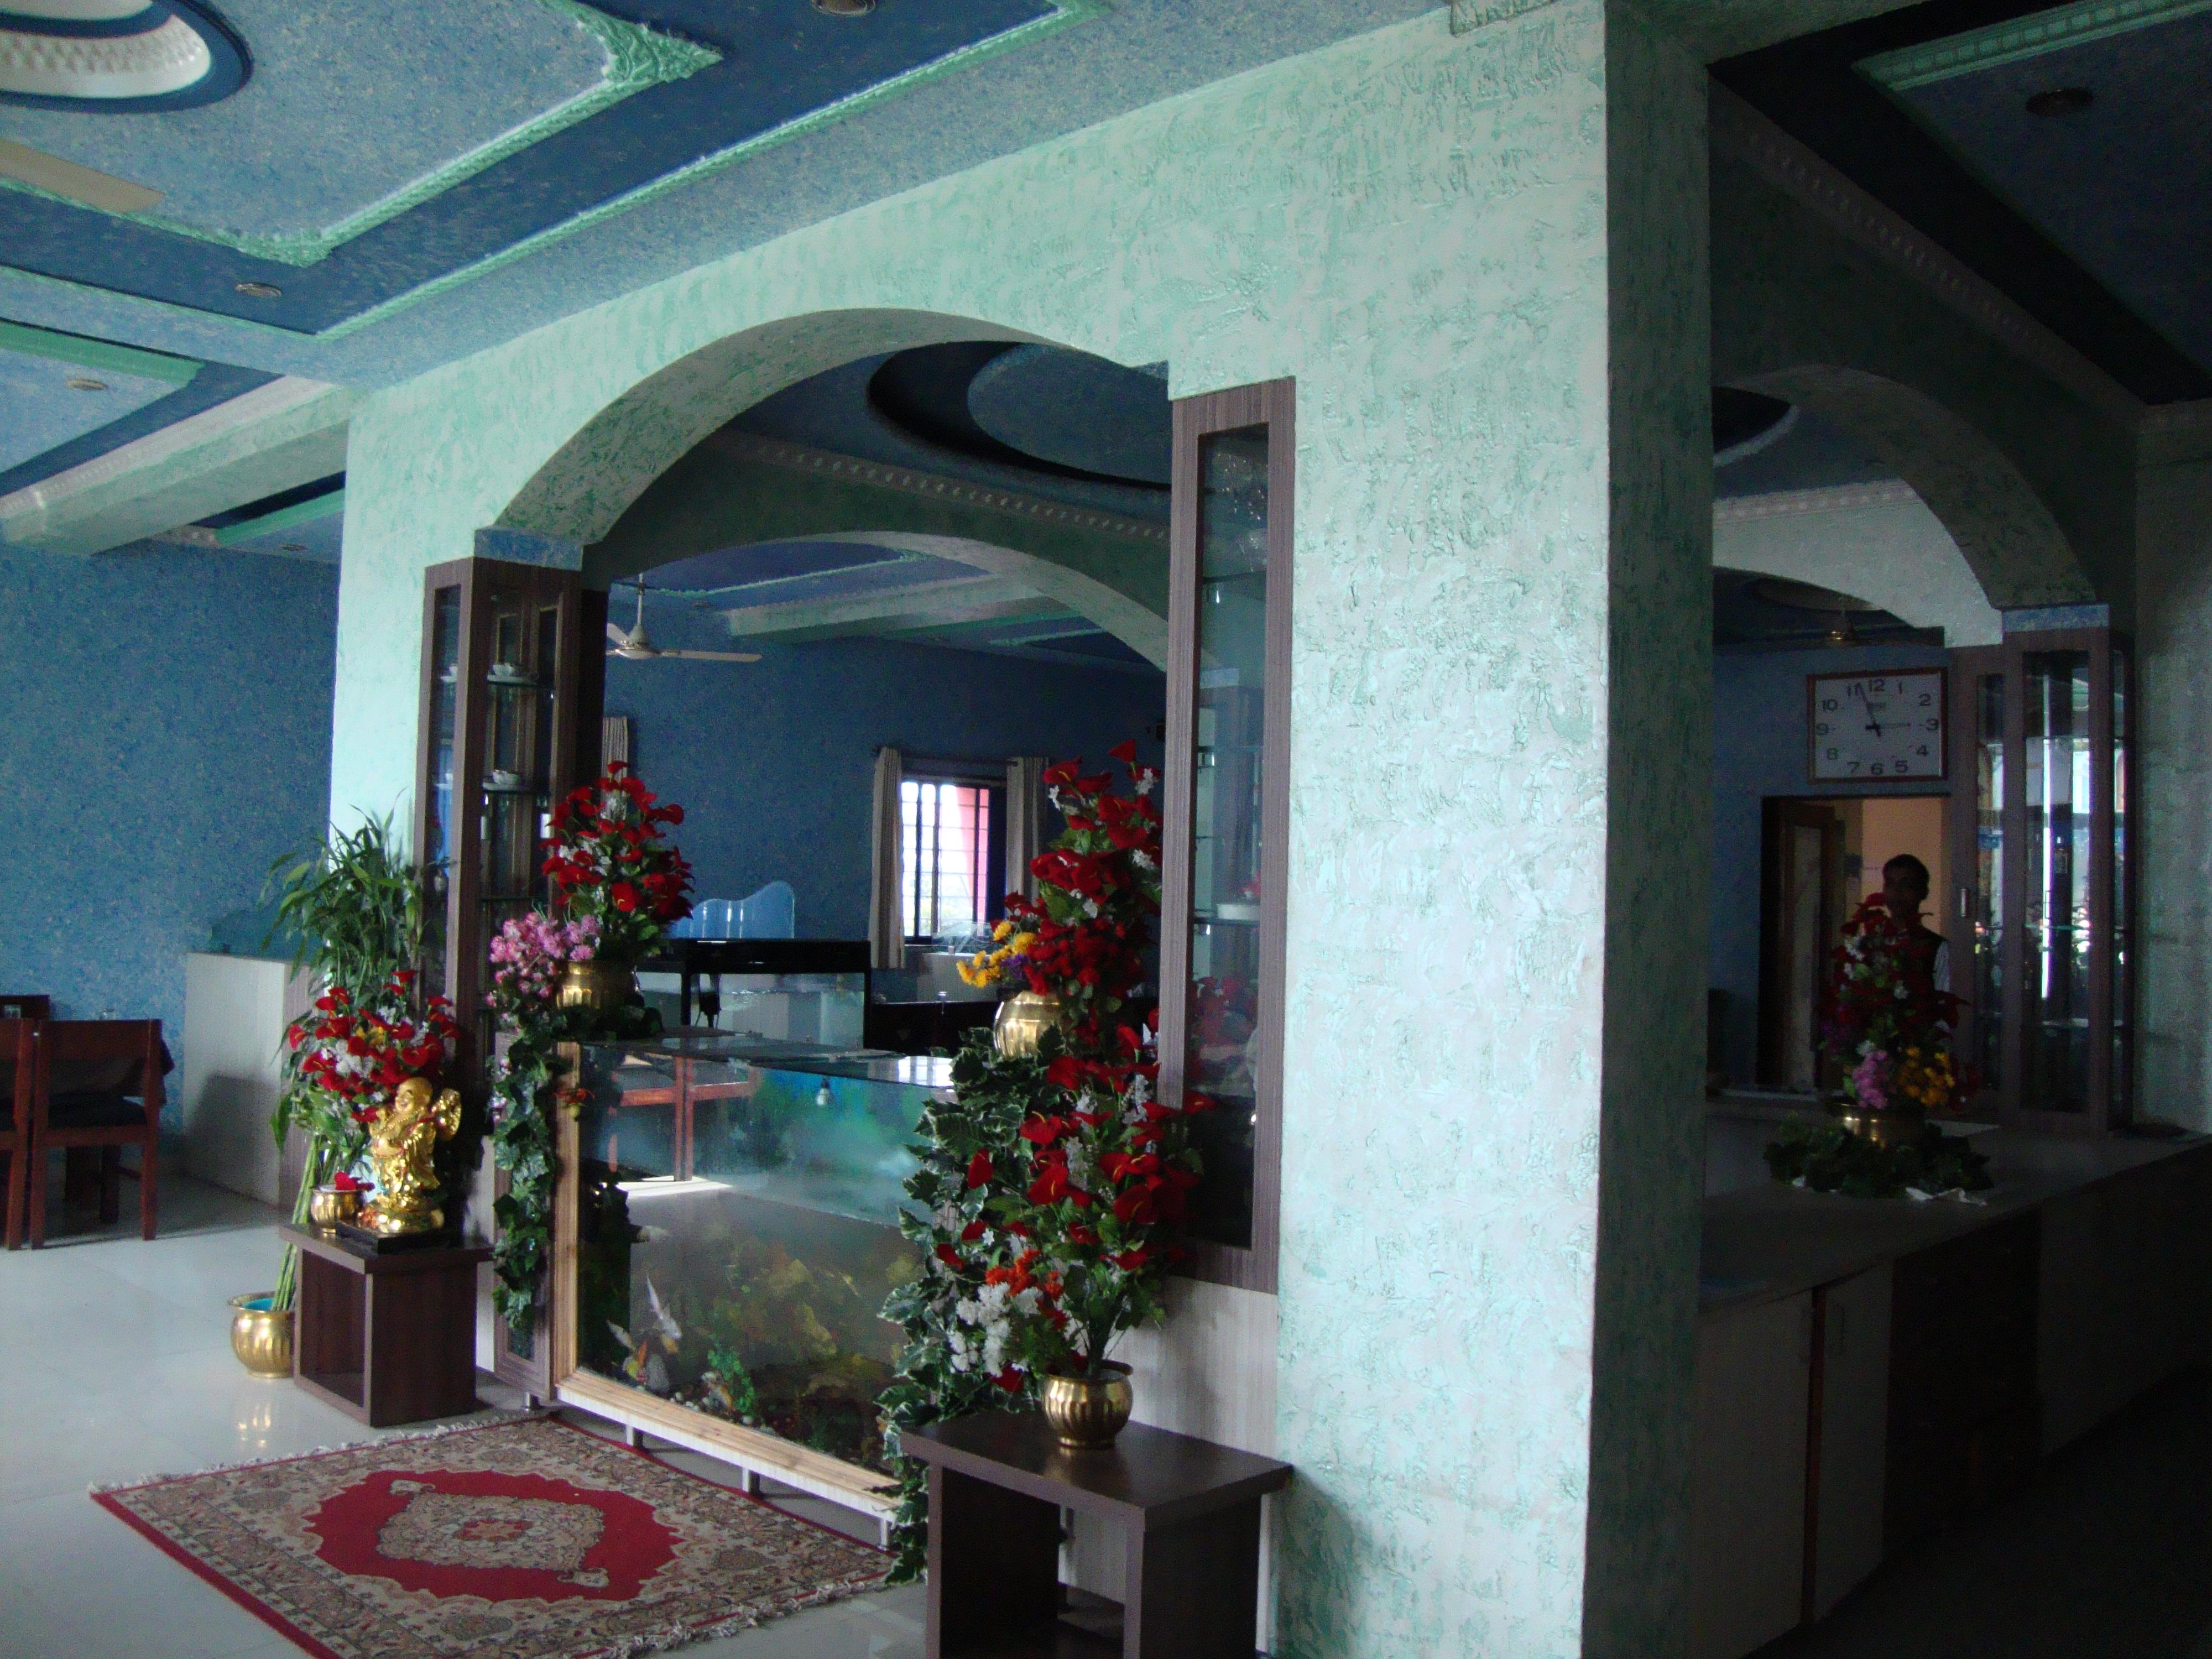 Hotel Royal Star Filehotel Royal Blue 3 Star In Side Pune Benglore High Wayjpg